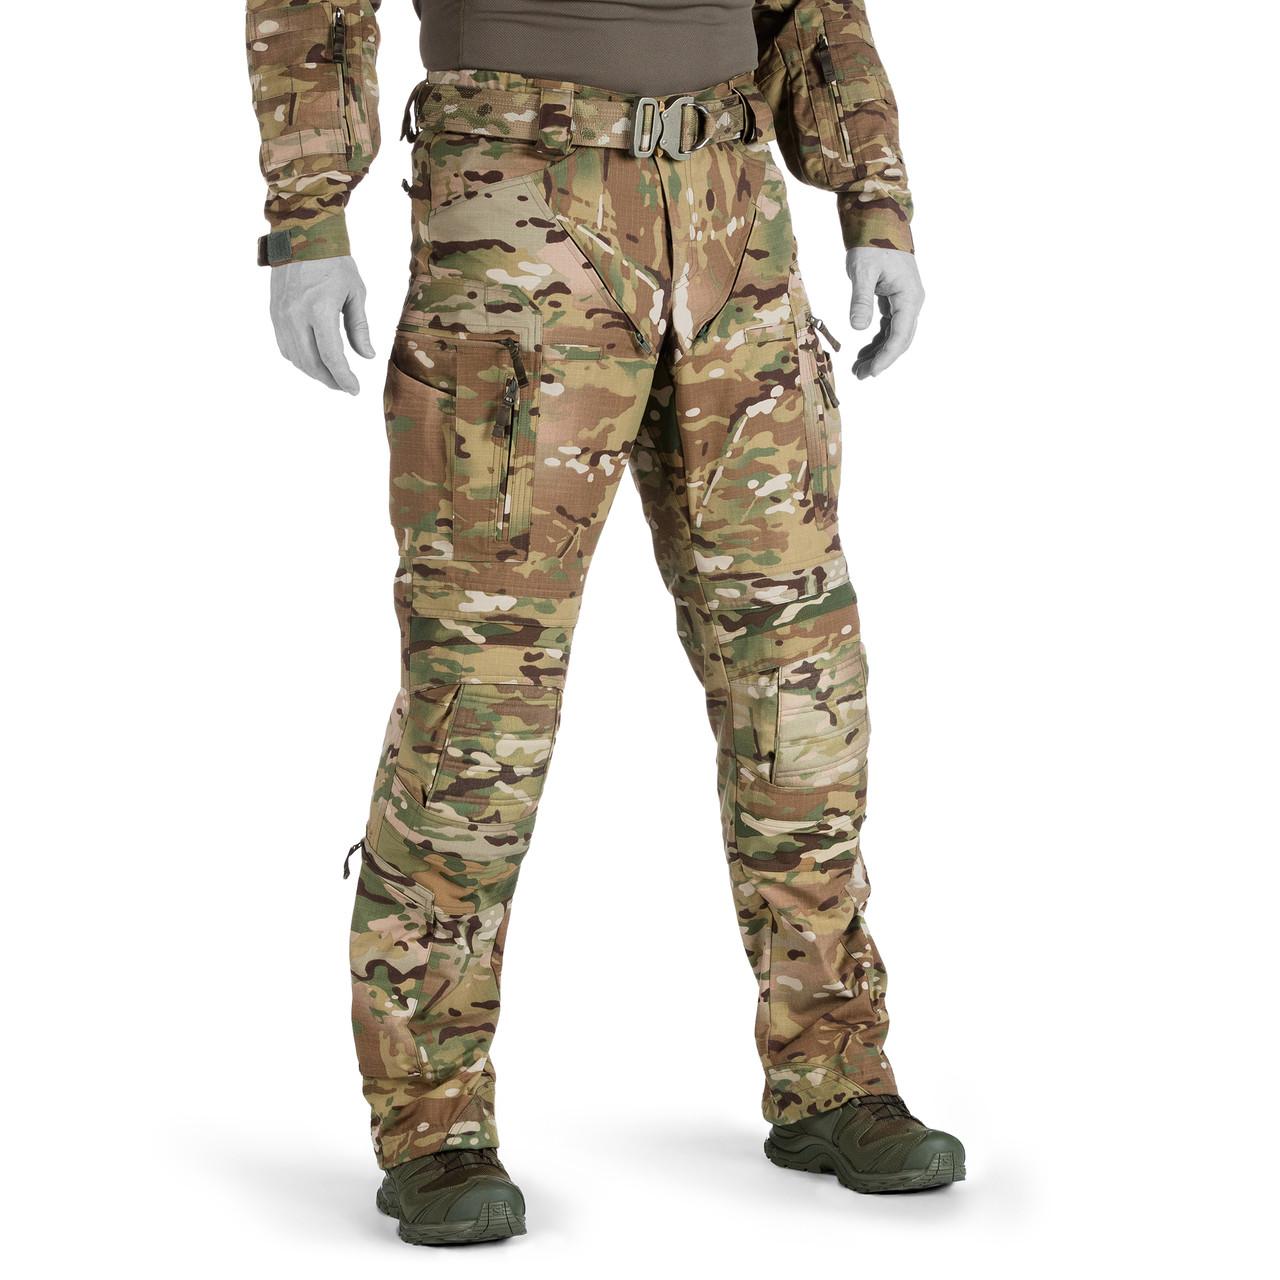 87ef3b84832c69 Striker-ht-combat-pants-multicam-hero-2019-641__52098.1563388782.jpg?c=2&imbypass=on